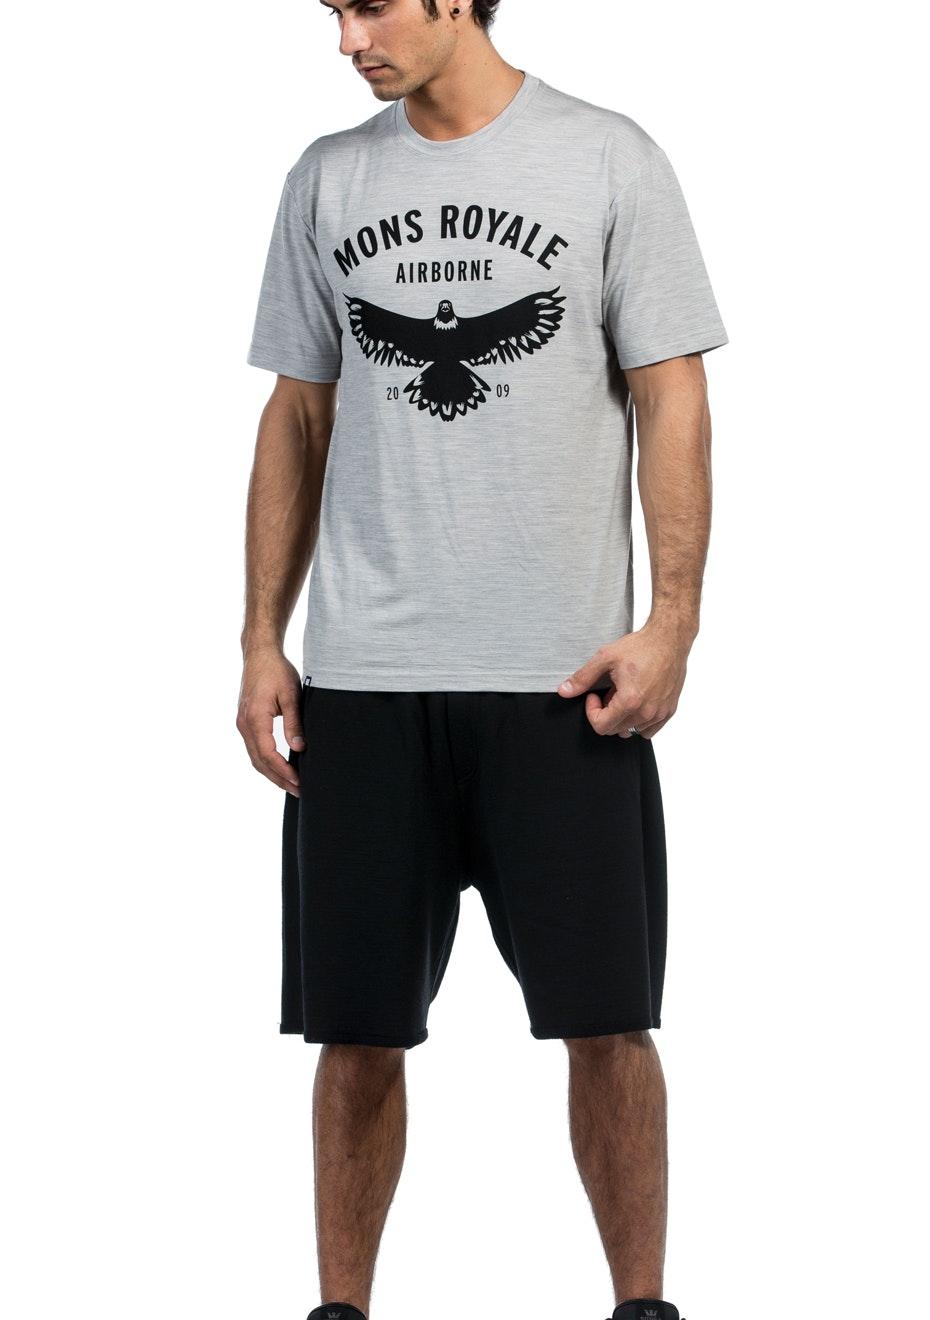 MONS ROYALE - Mens - Rocky Shorts - Black